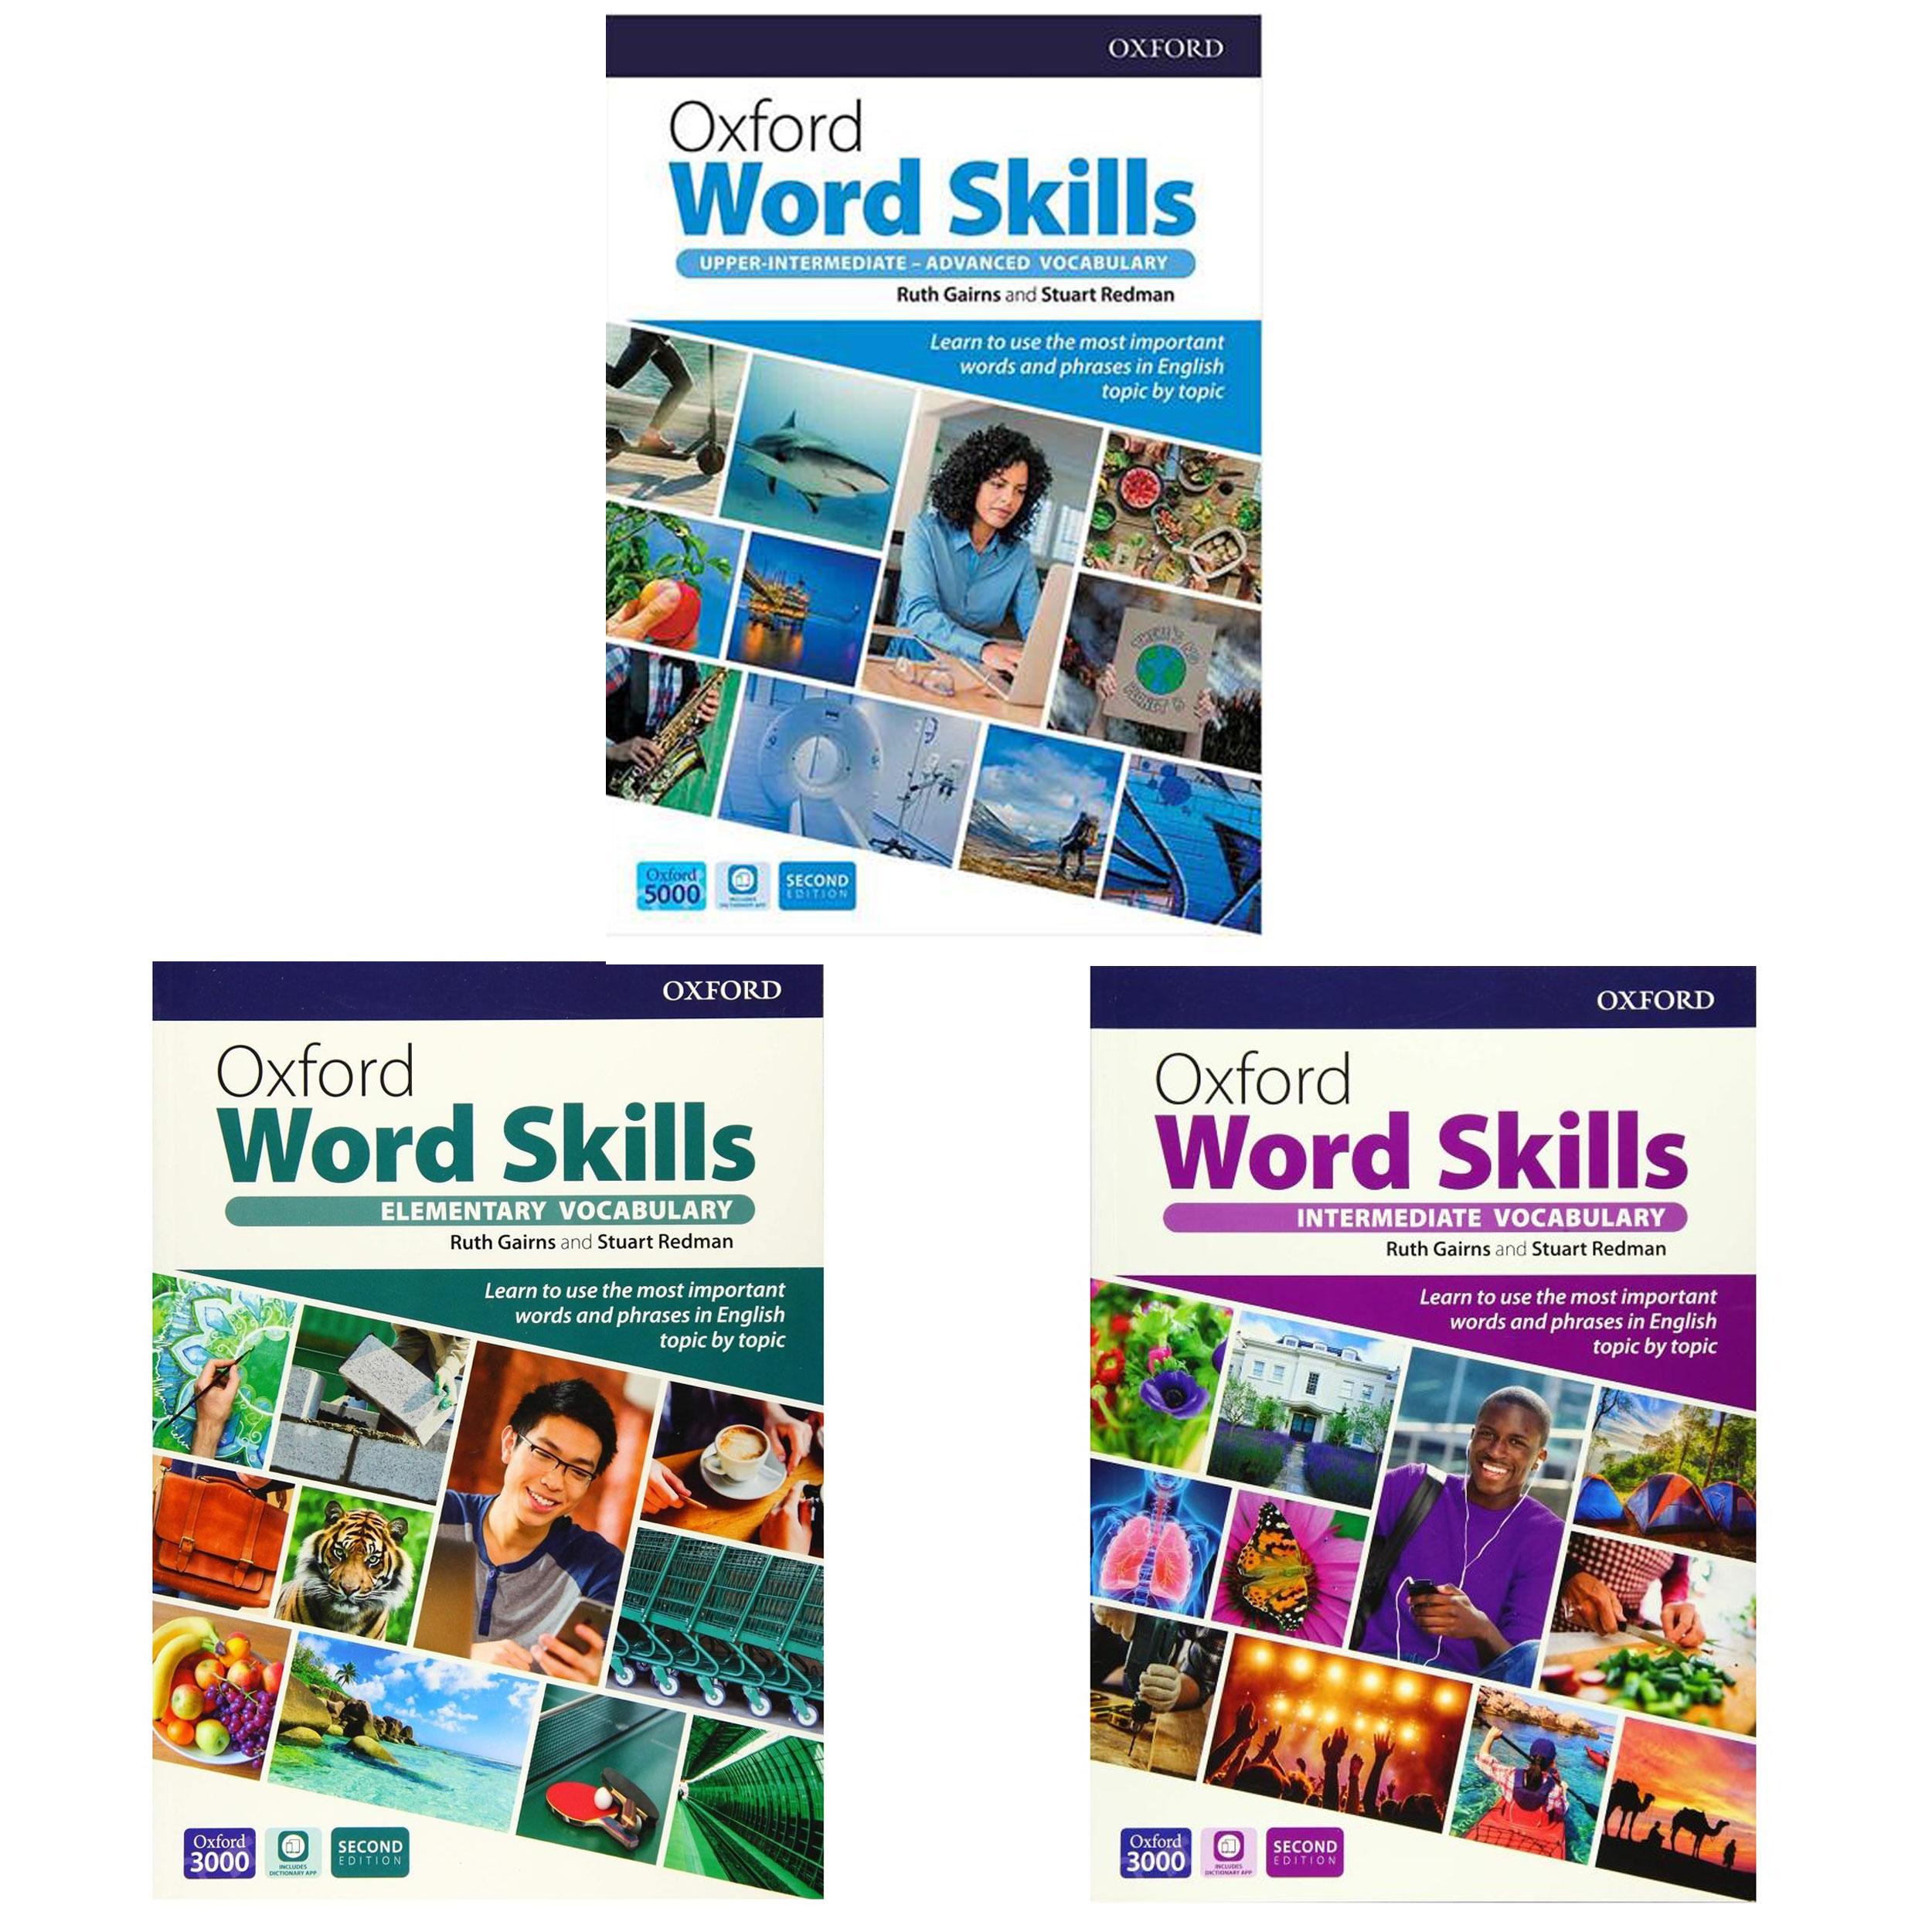 کتاب Oxford Word Skills Second Edition اثر Ruth Gairns And Stuart Redman انتشارات Oxford  سه جلدی